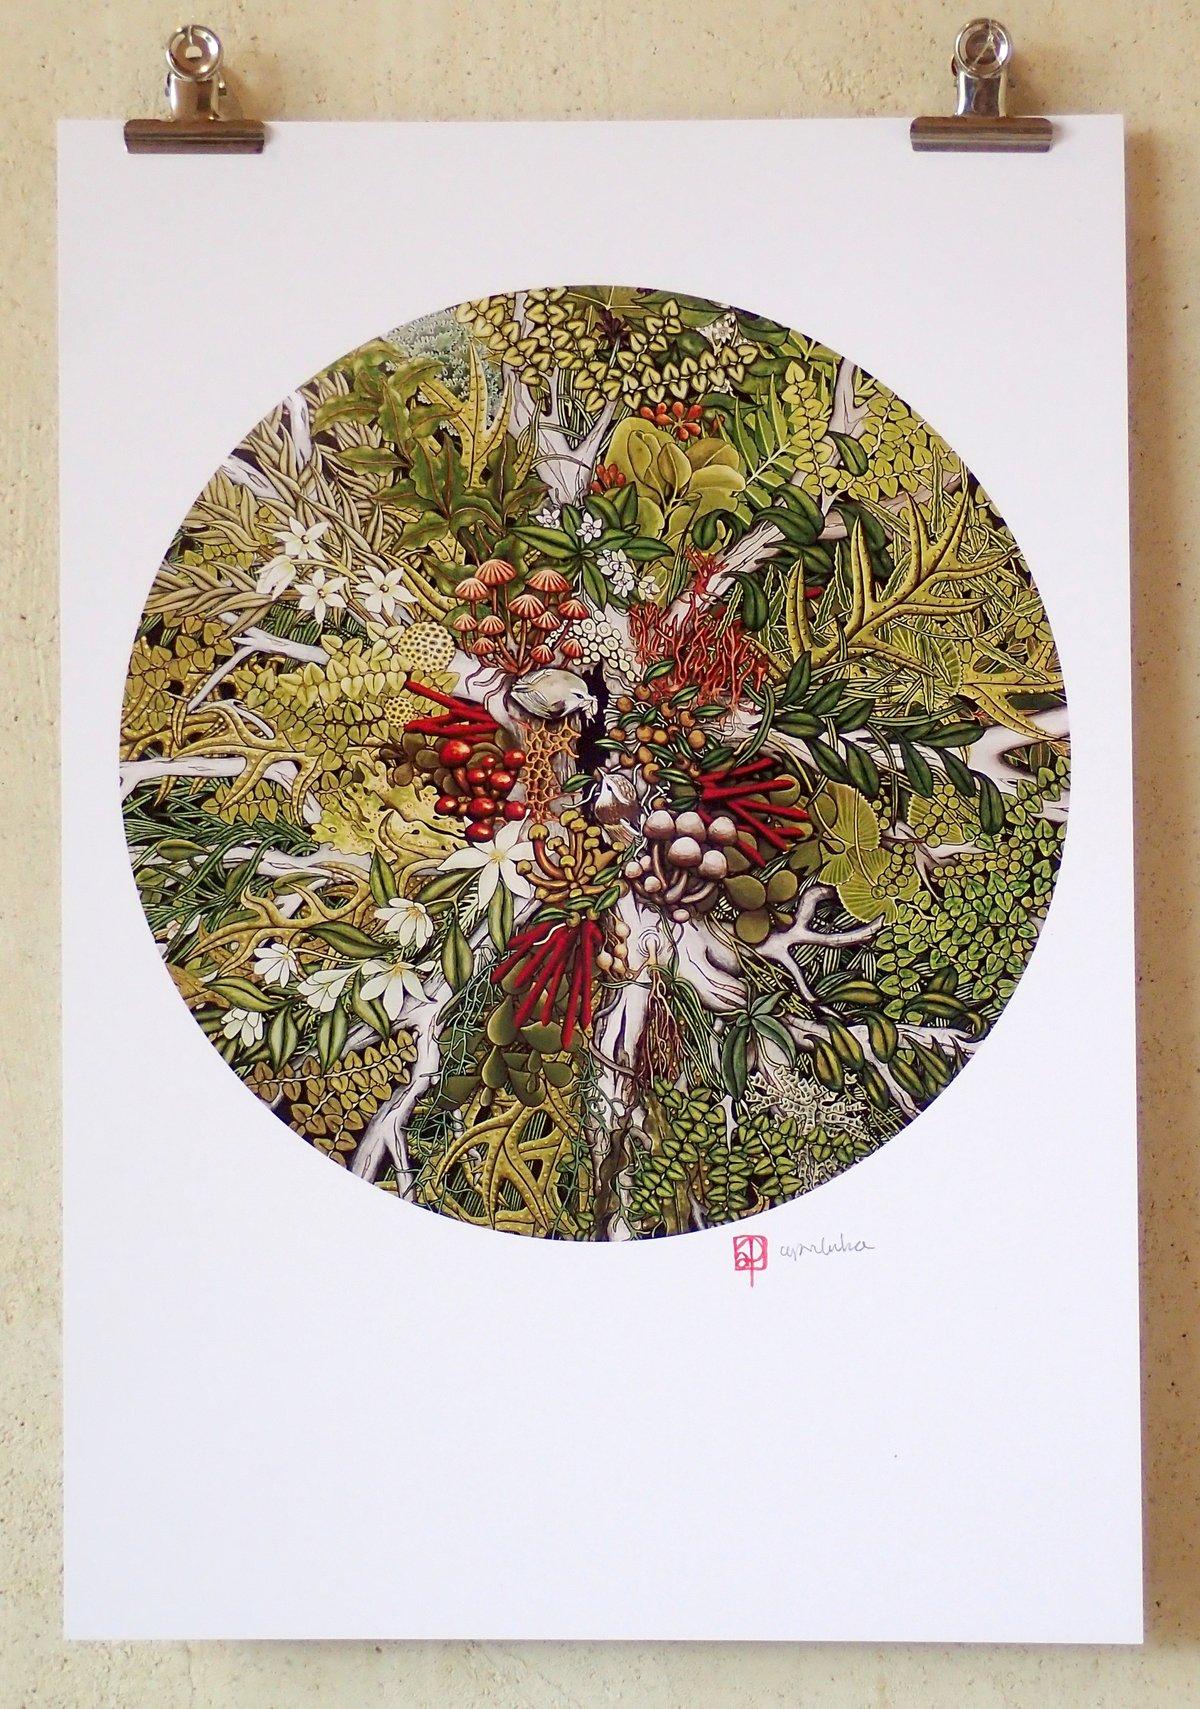 'Canopy Ecosystem' A3 Print